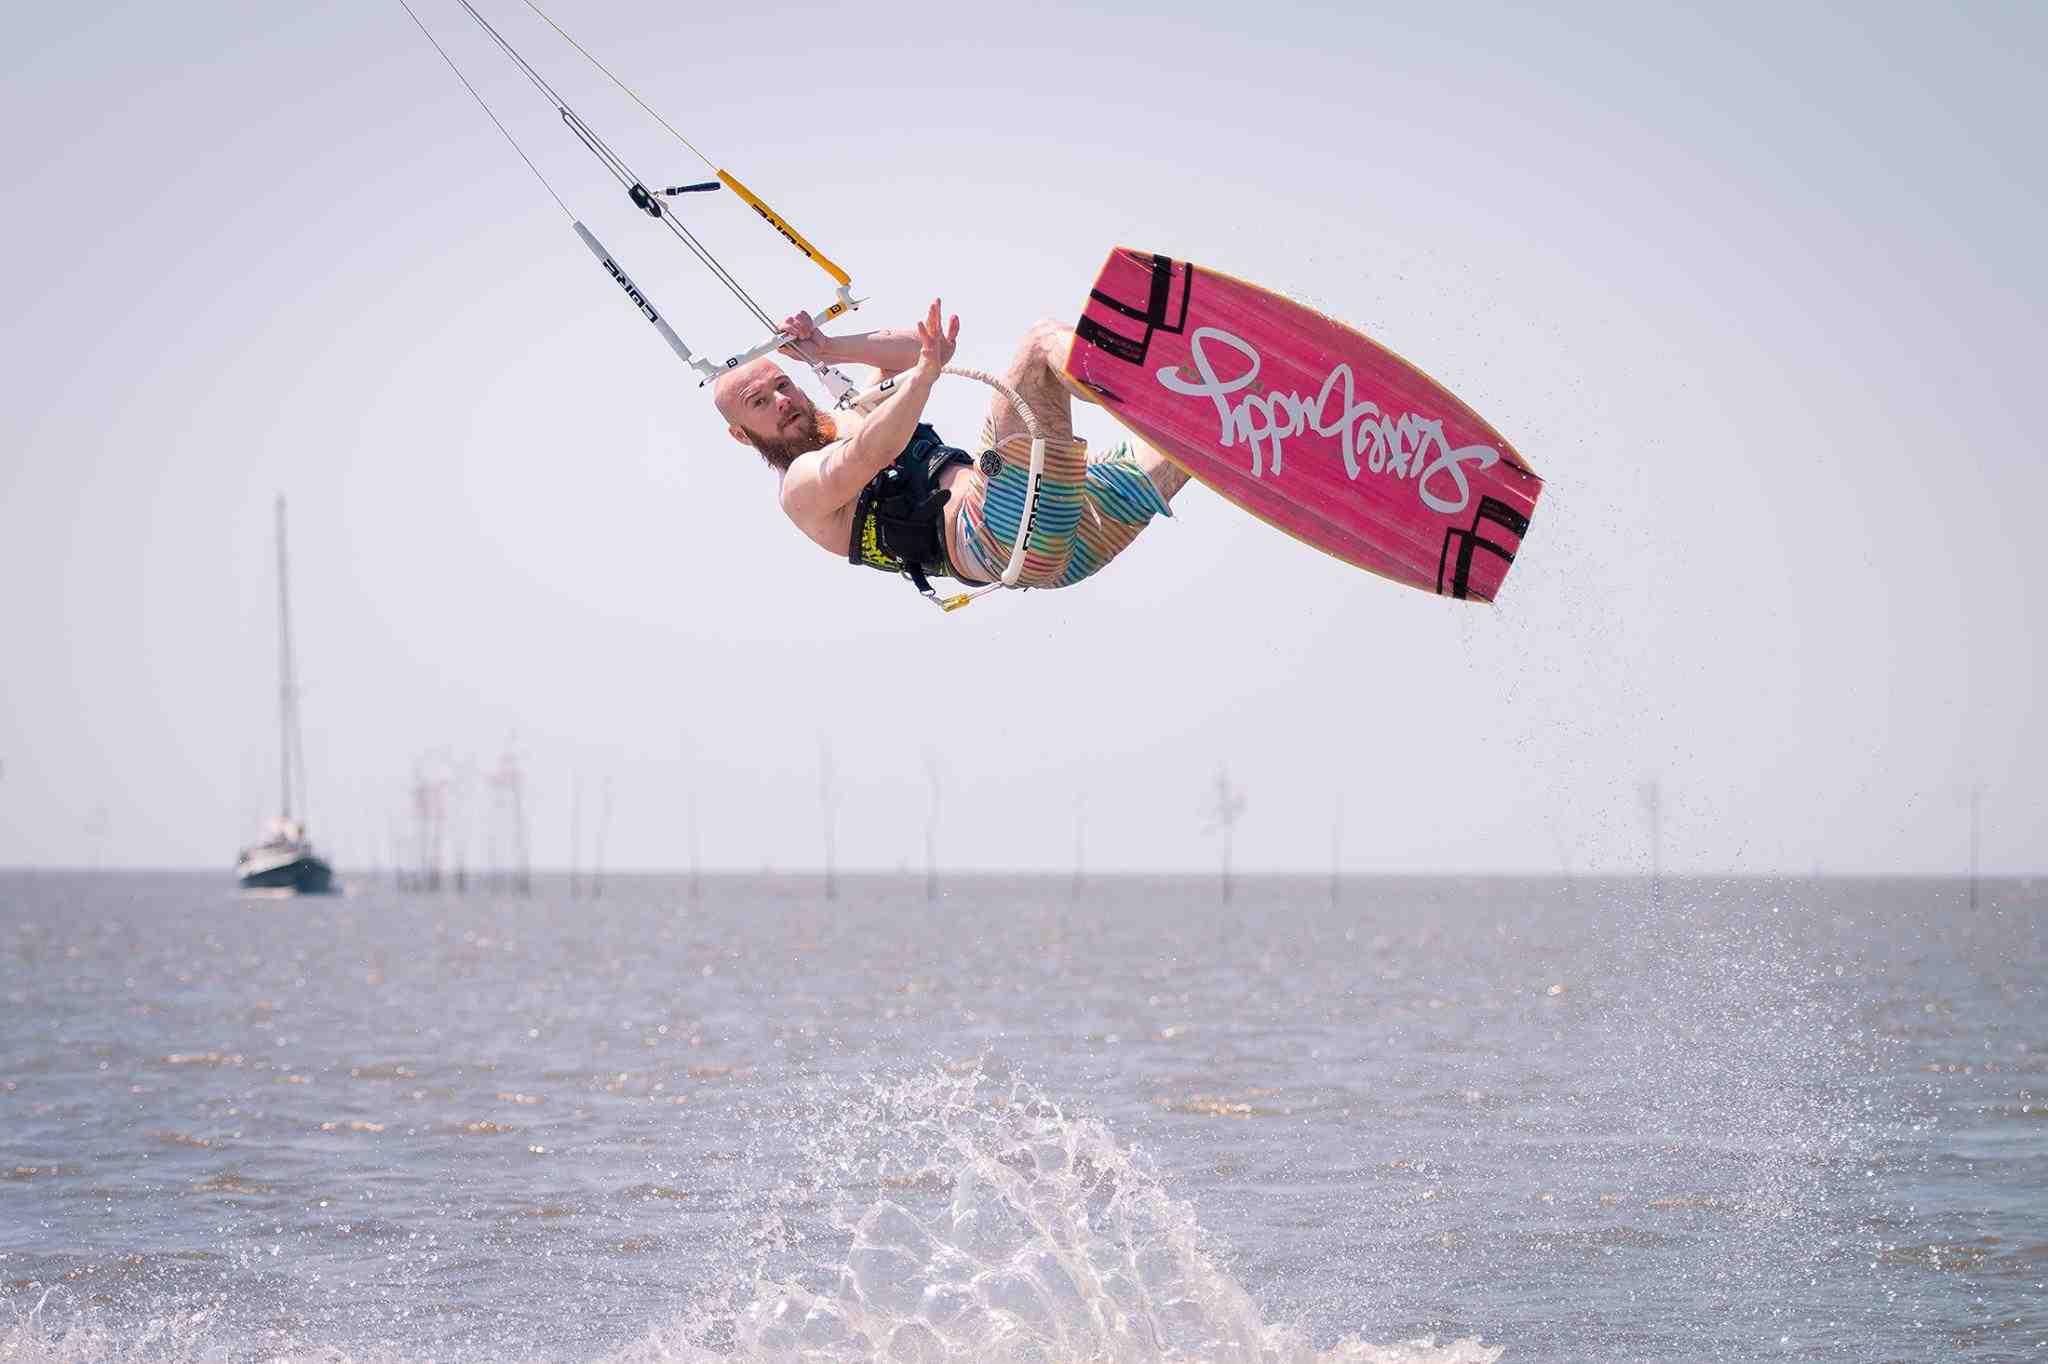 anton-kiteboard-free-k-testbericht